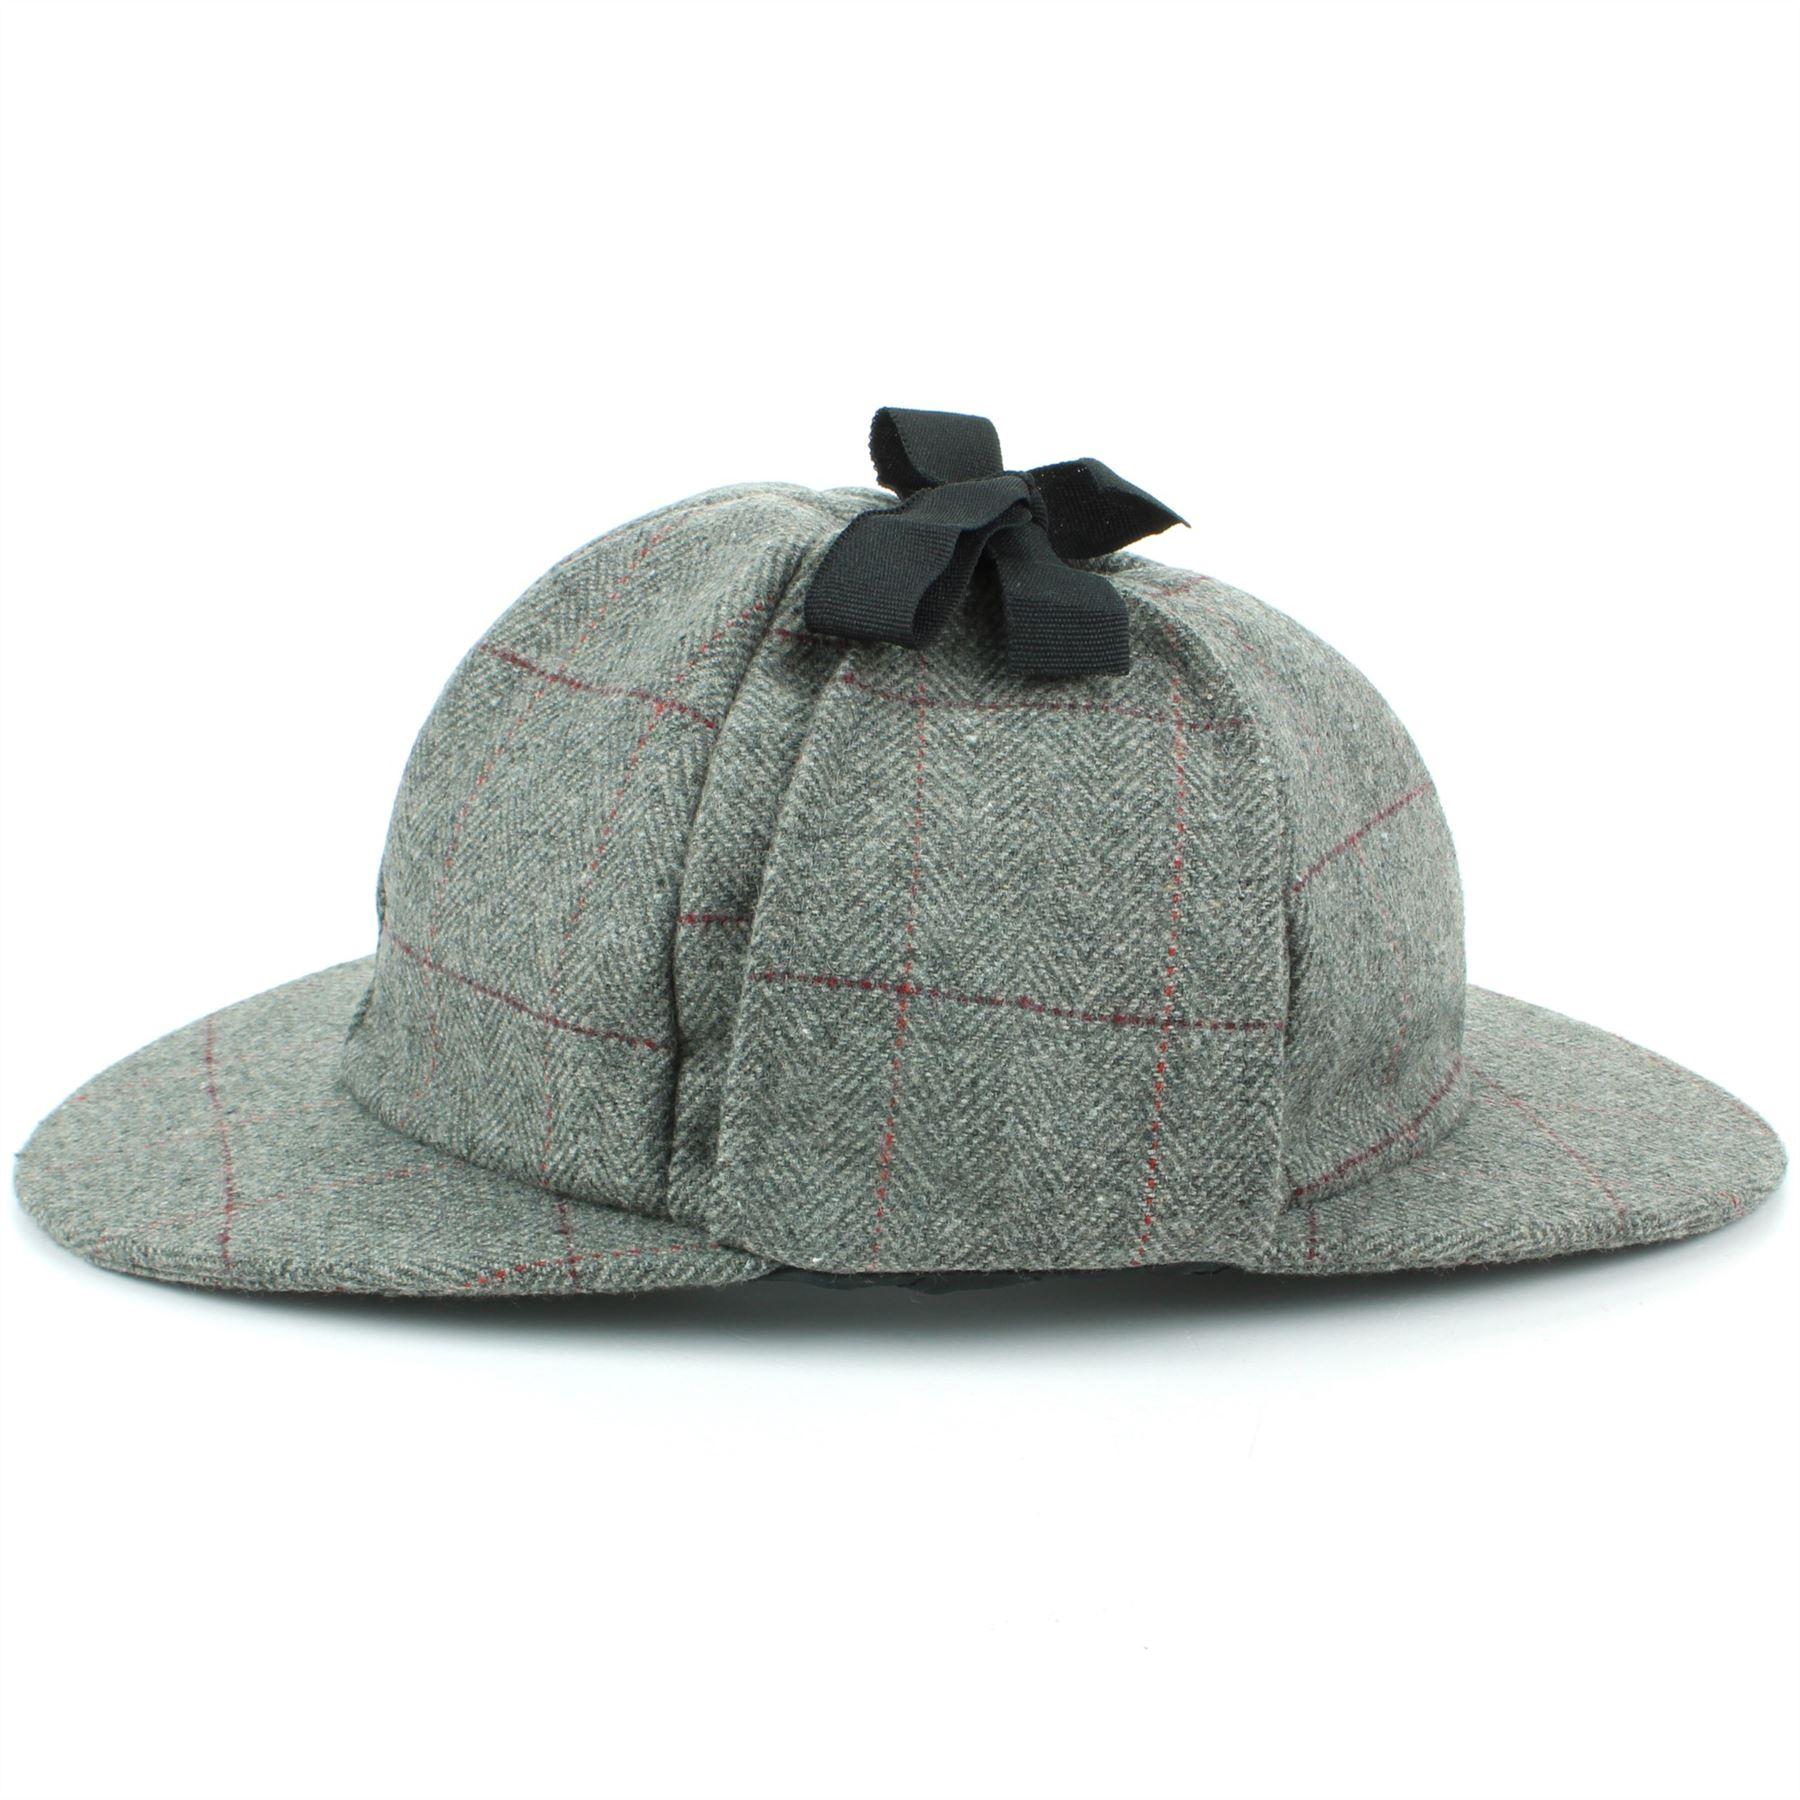 Hawkins Sherlock Holmes Tweed Cappello di Deerstalker con Due Peaks e Paraorecchie